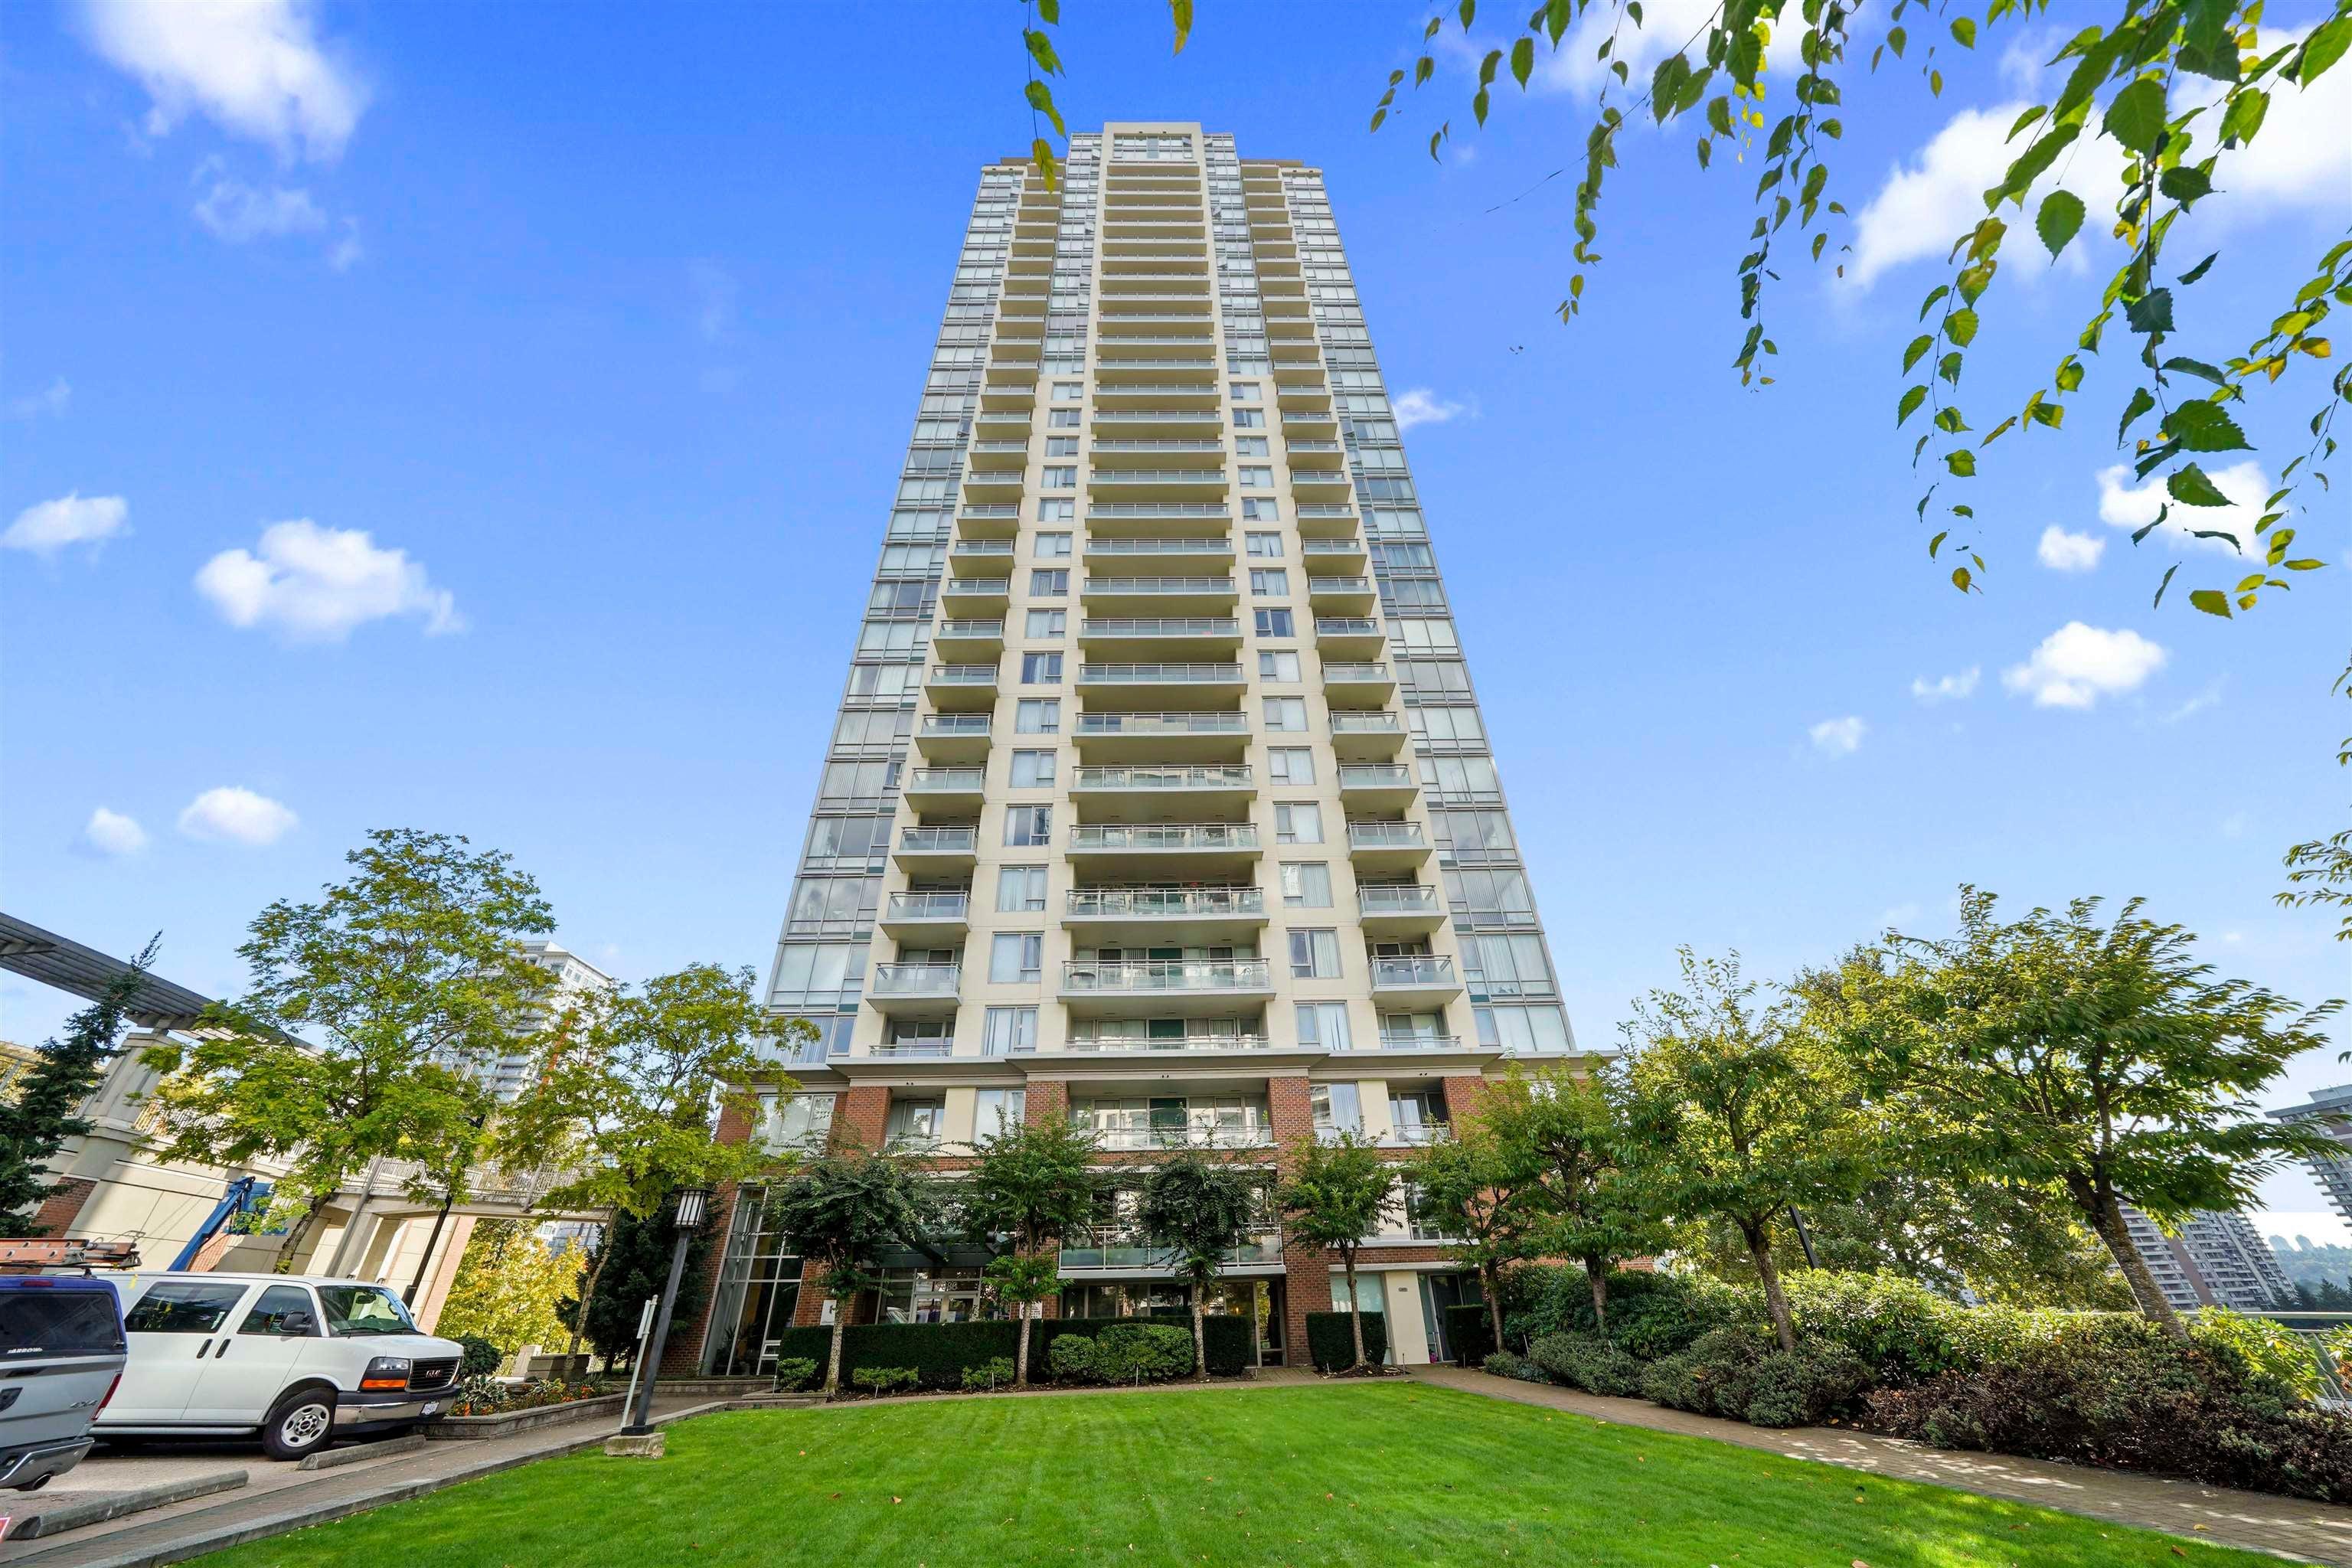 3501 9888 CAMERON STREET - Sullivan Heights Apartment/Condo for sale, 1 Bedroom (R2624763)